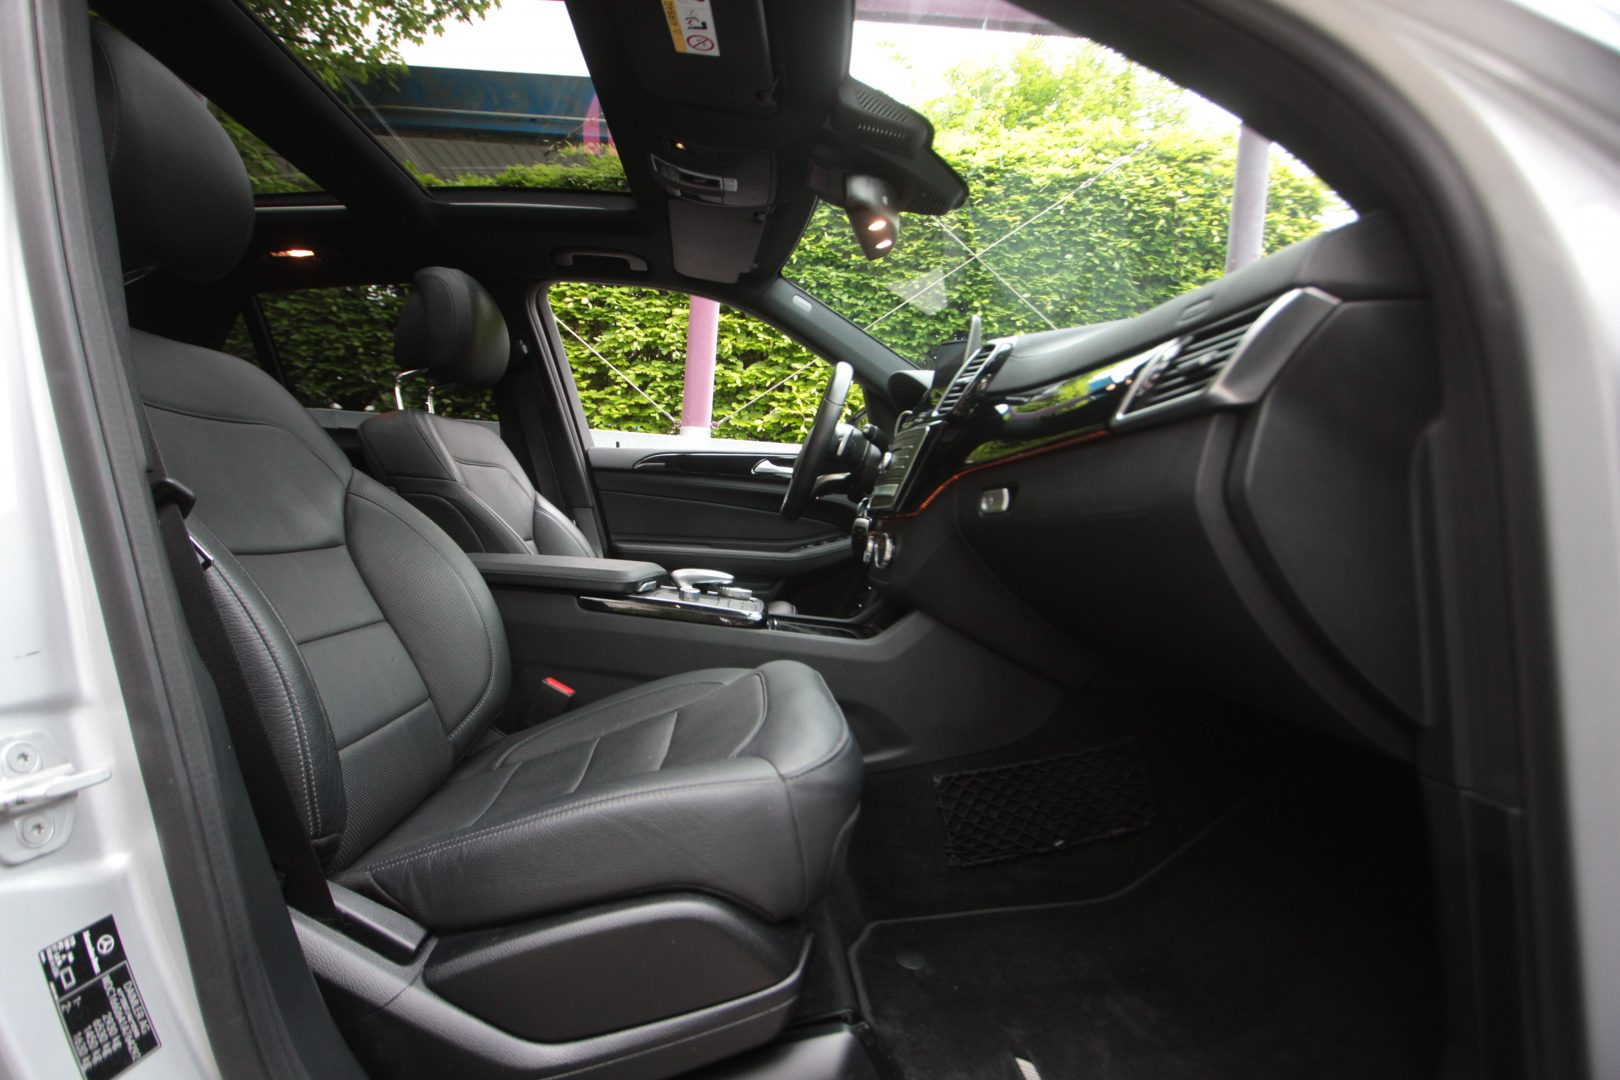 AIL Mercedes-Benz GLE 450 AMG 4Matic 3